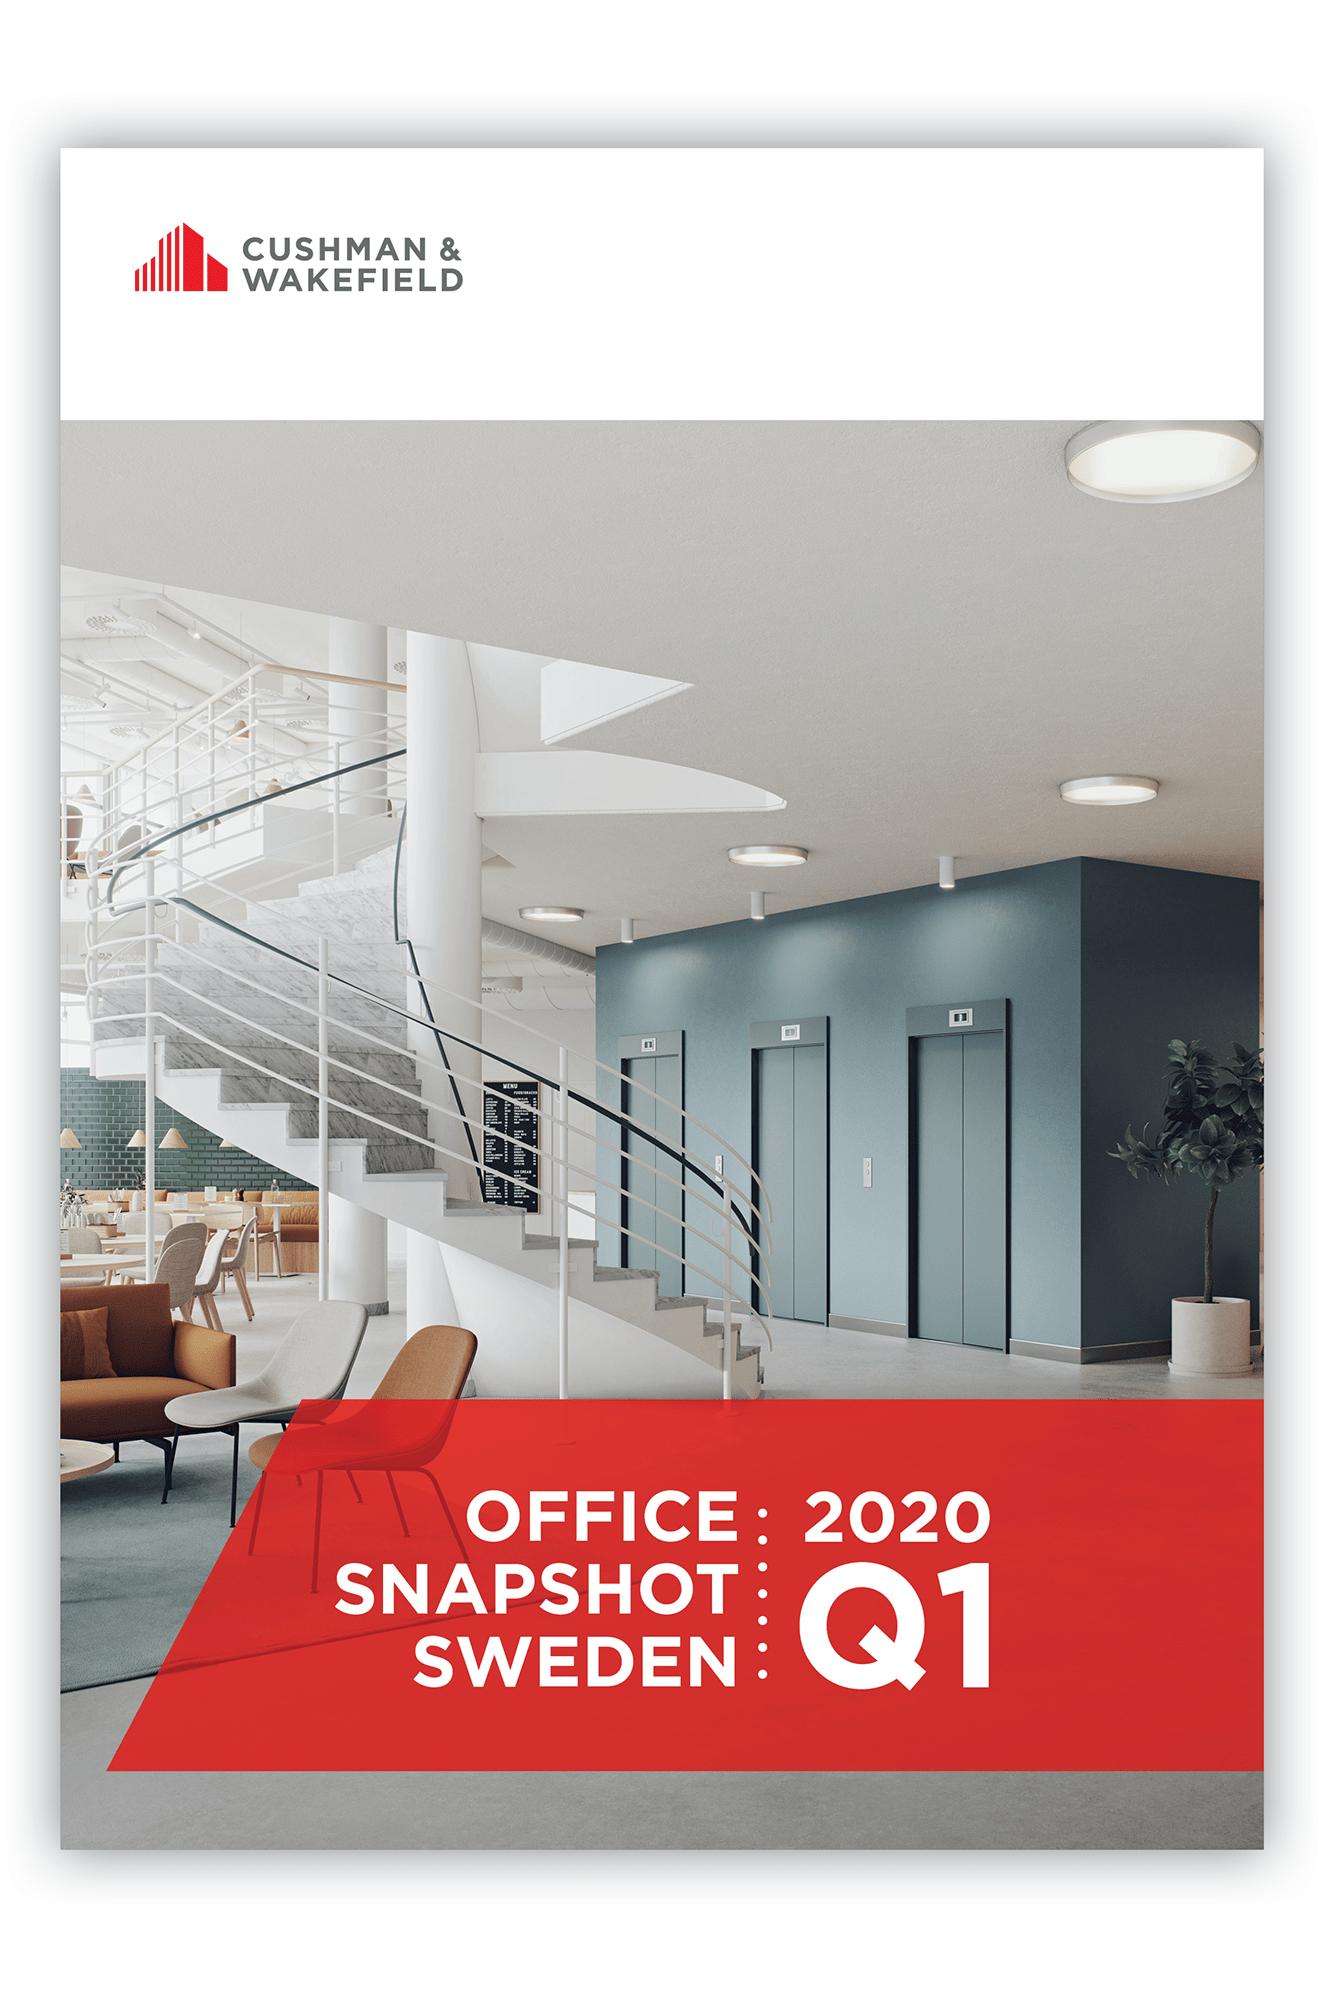 2020 Q1 Sweden Office Snapshot